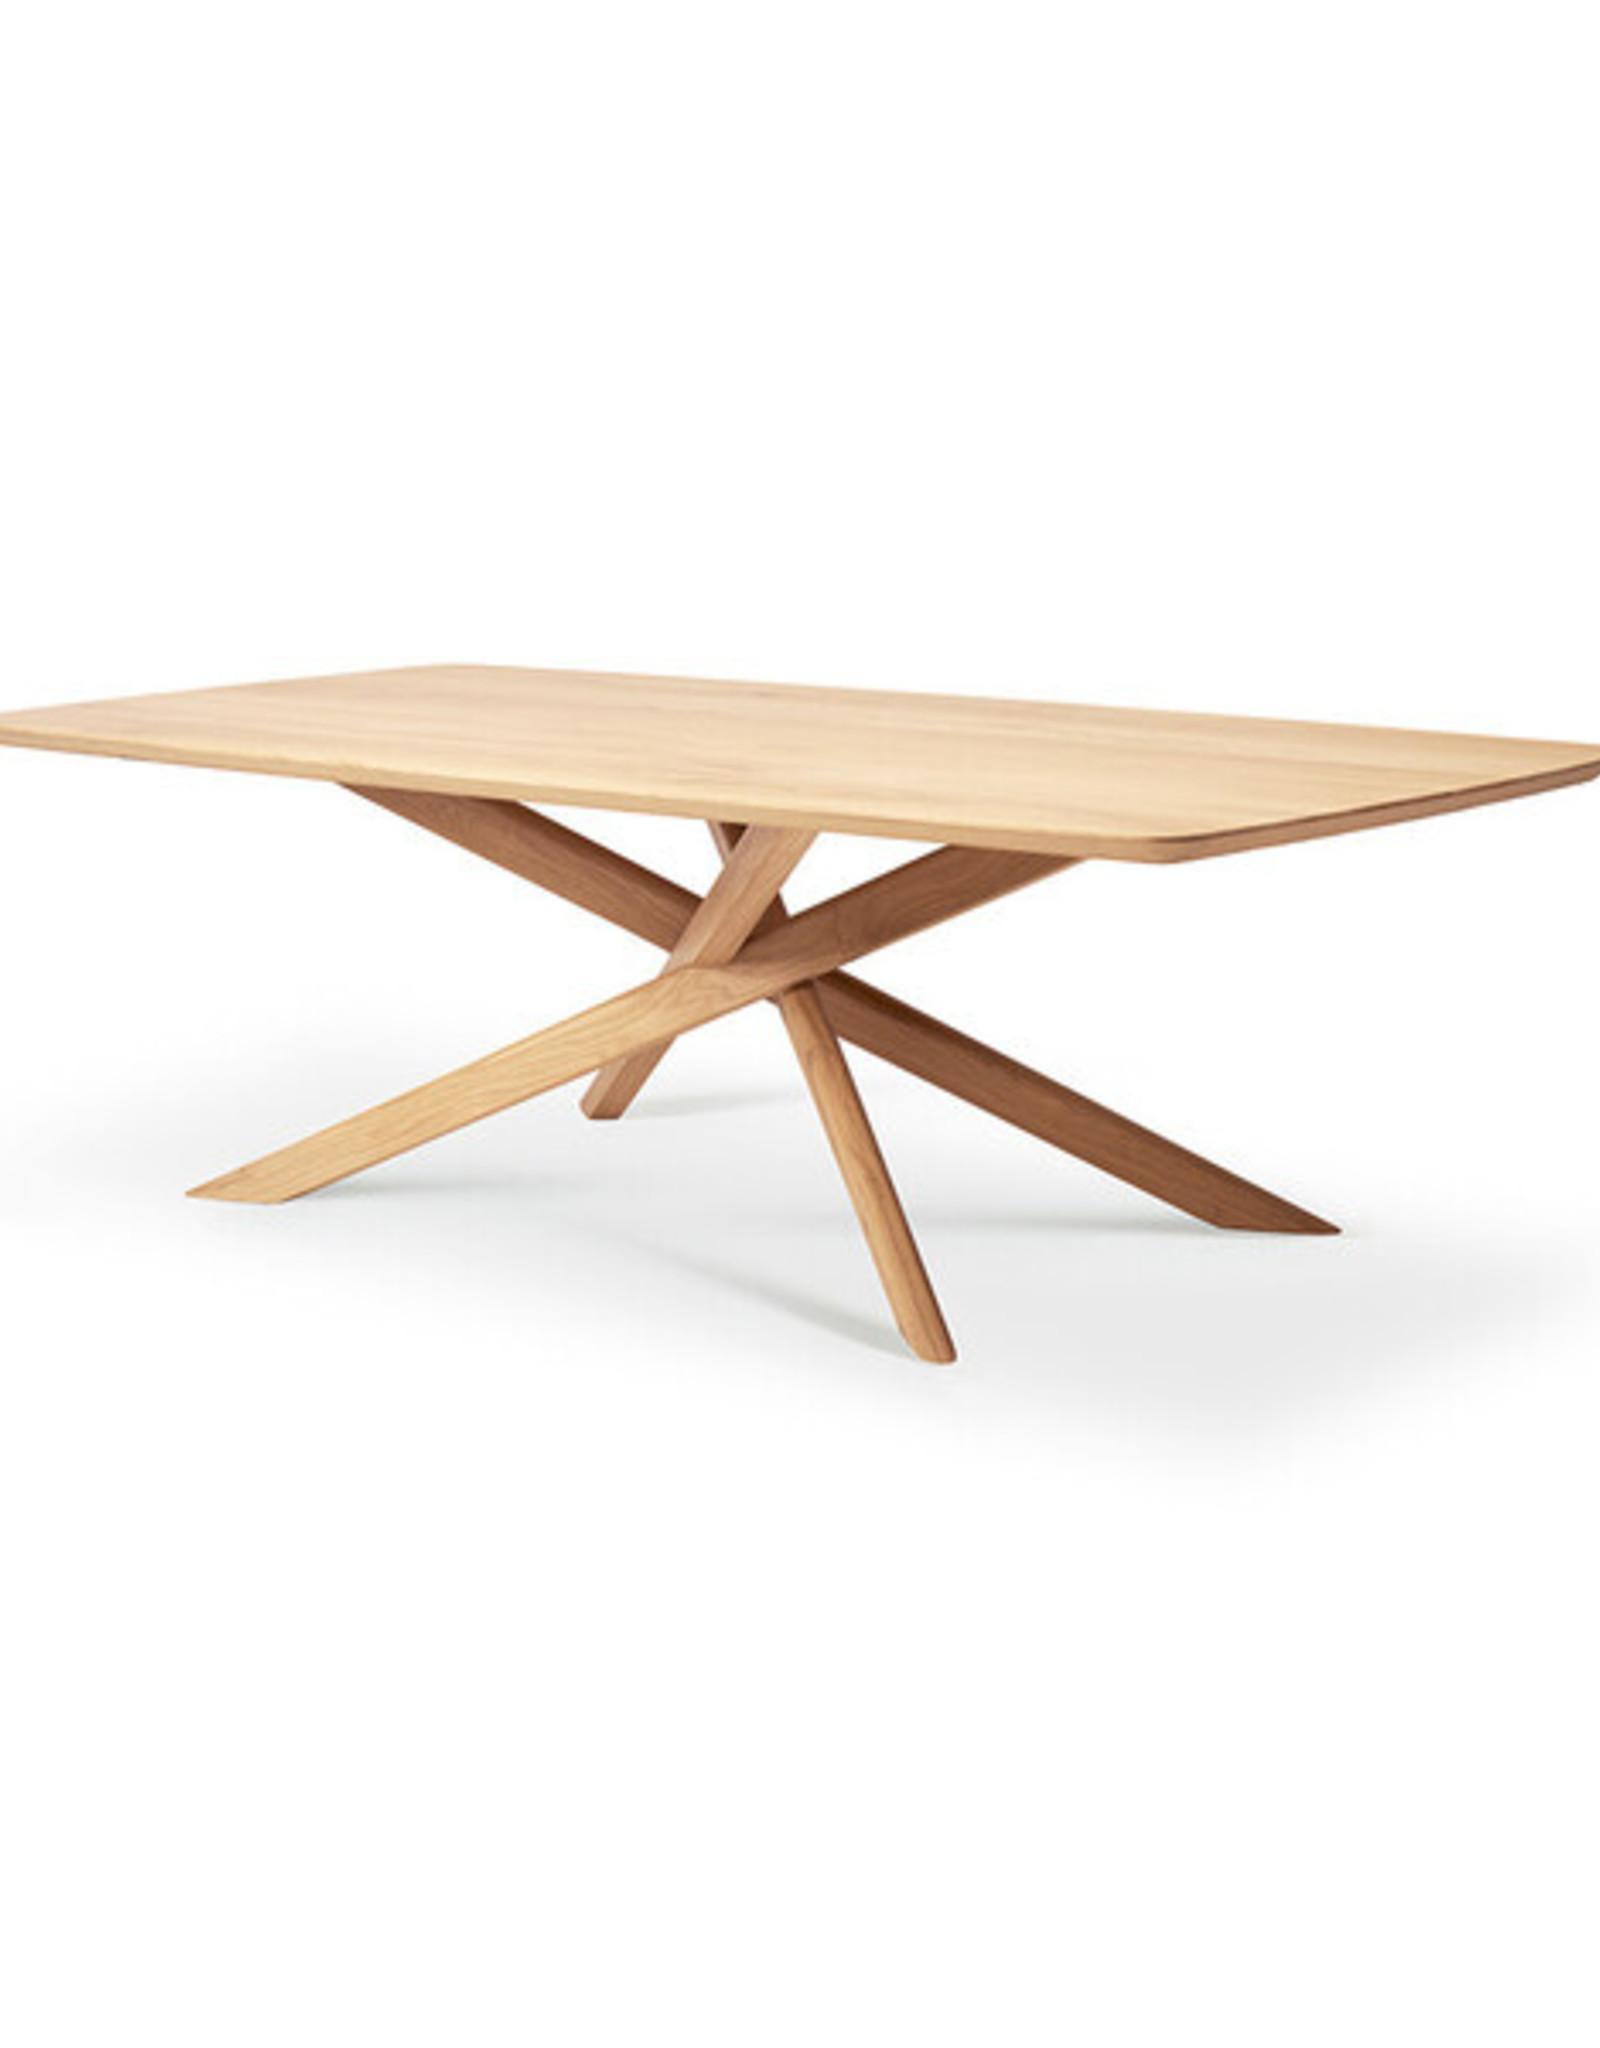 Oak Mikado coffee table - rectangular